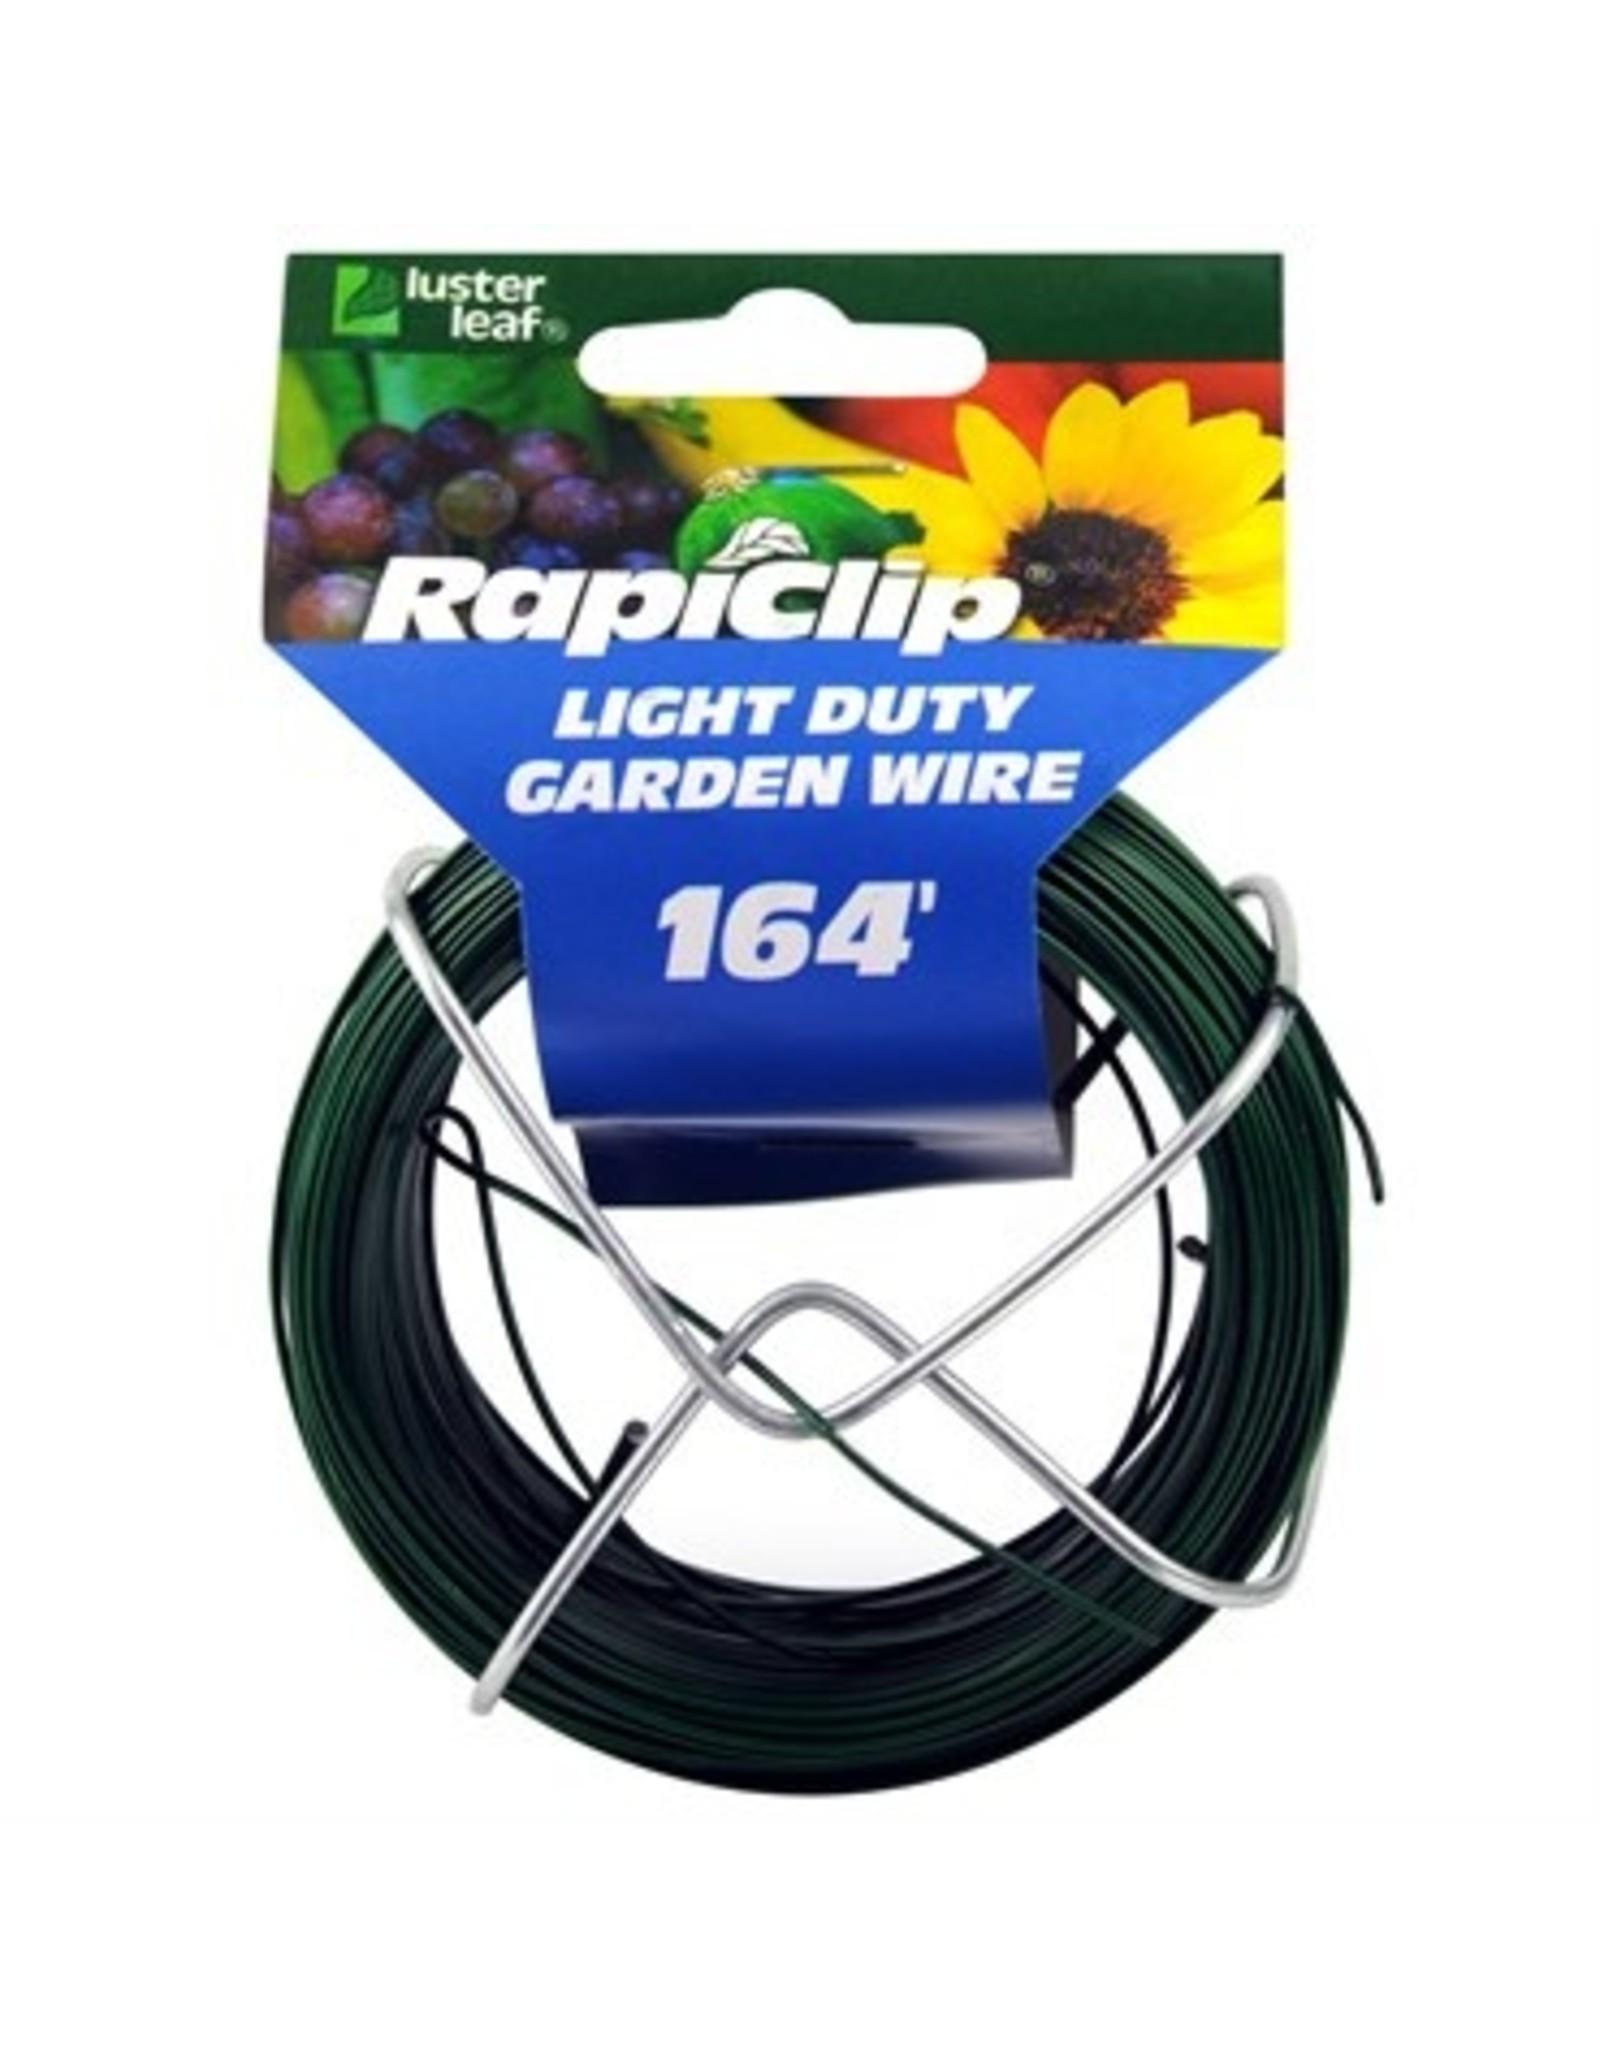 Light Duty Garden Wire - 164'